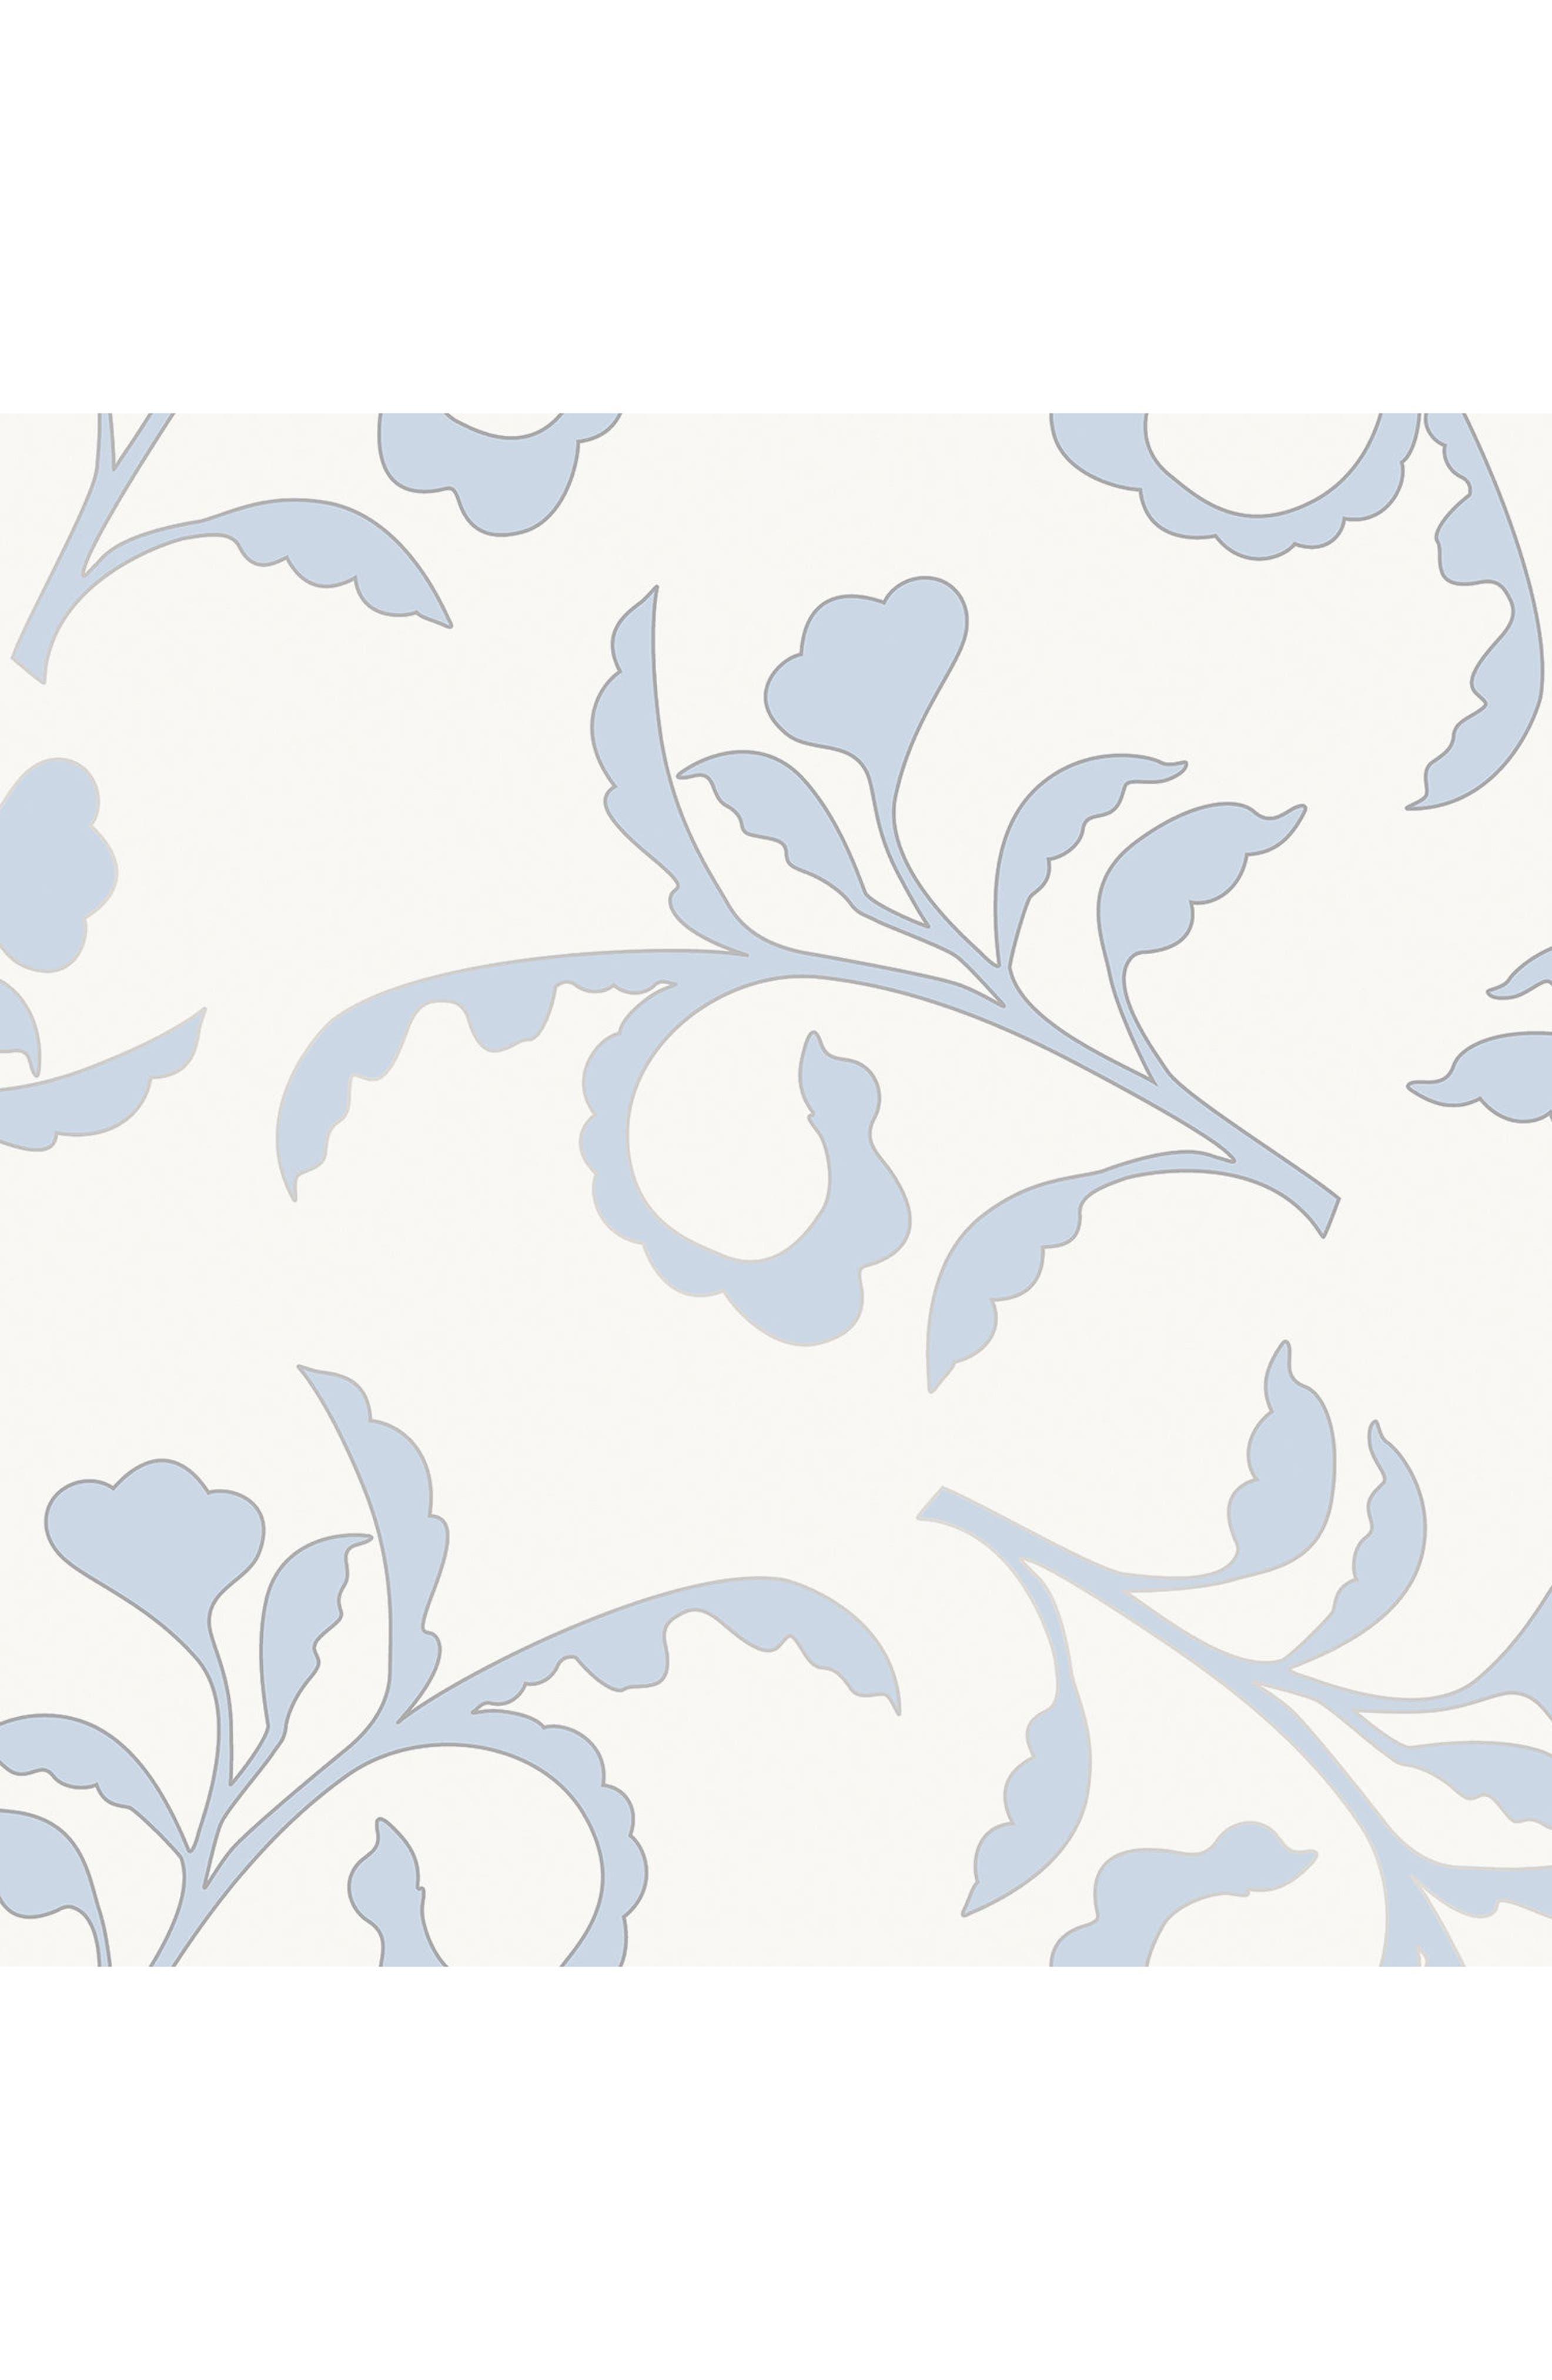 Big Branch Self Adhesive Vinyl Wallpaper,                         Main,                         color, Light Blue/ Ivory